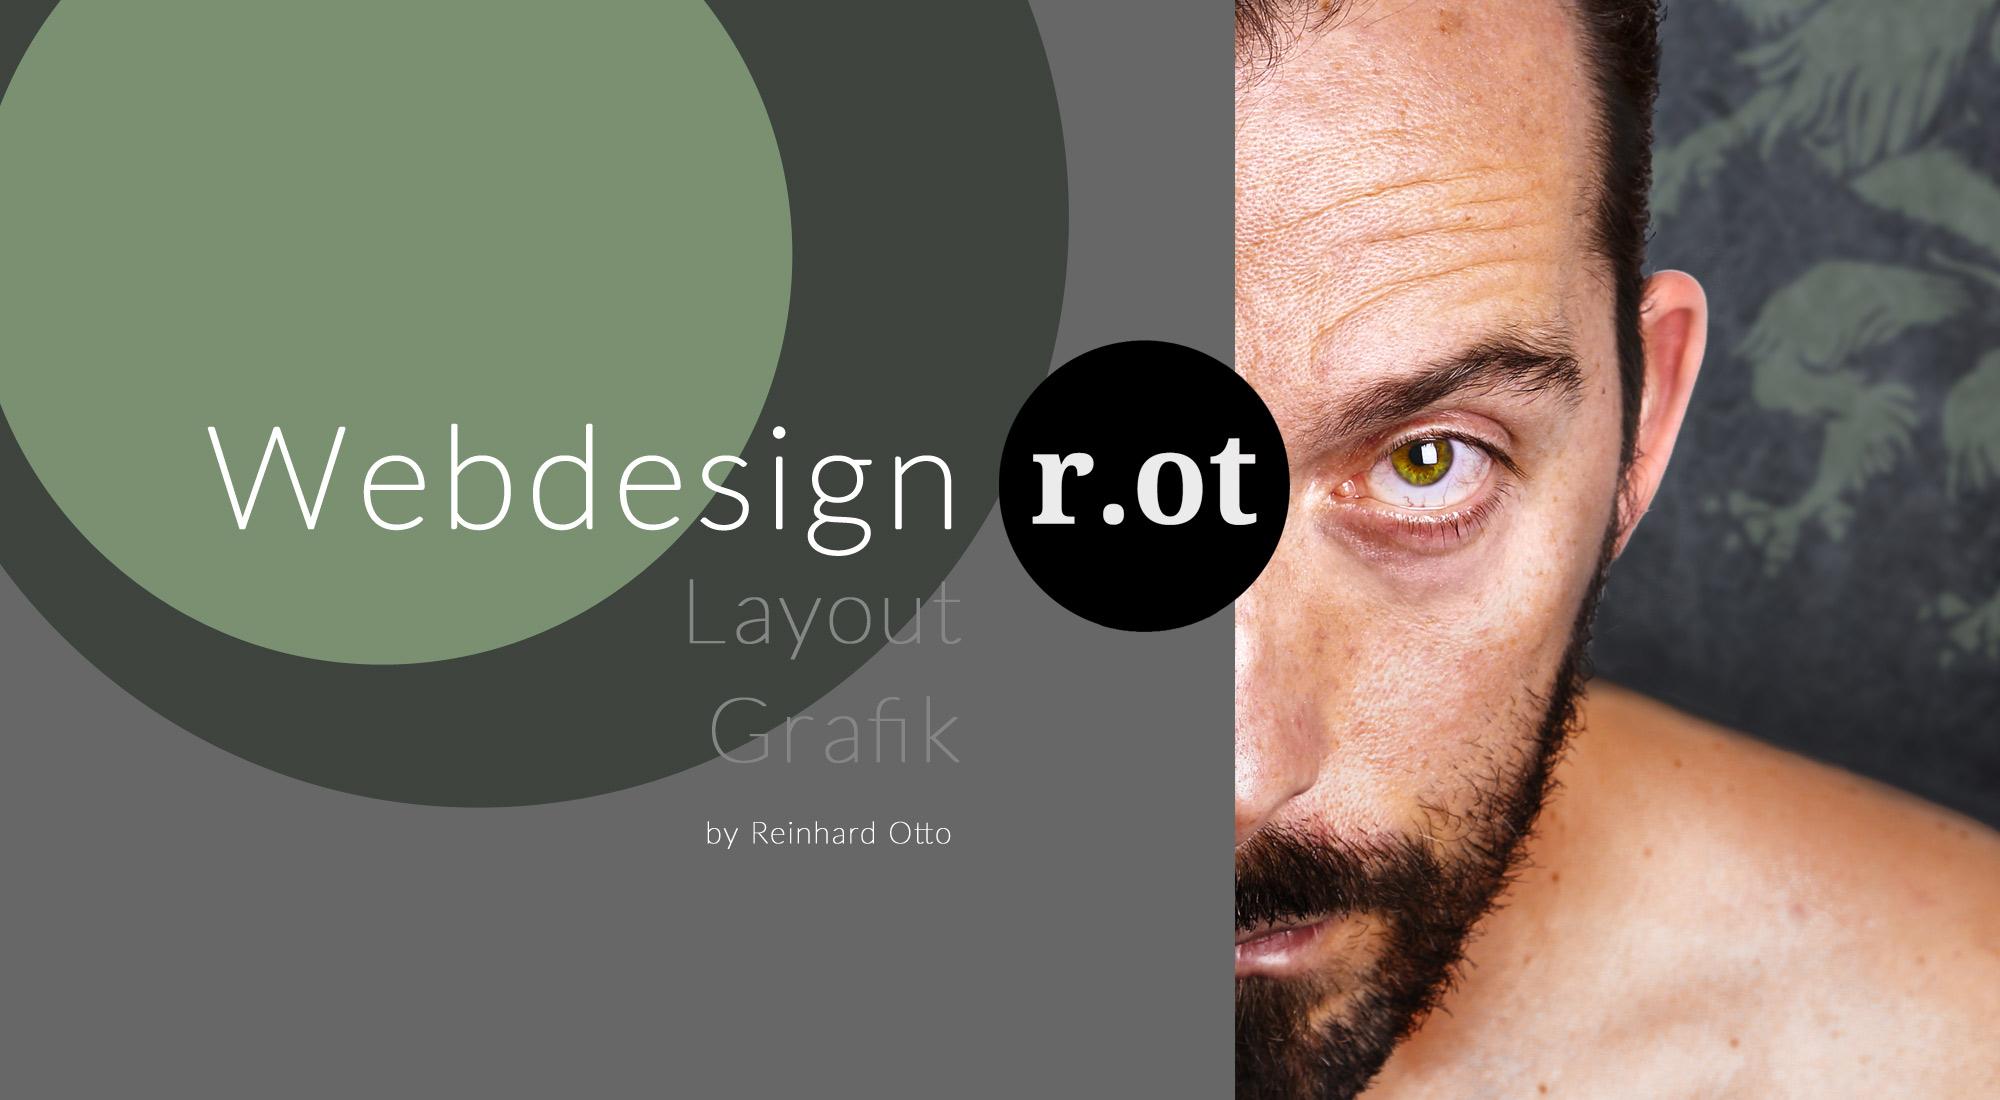 Reinhard Otto r.ot Webdesign